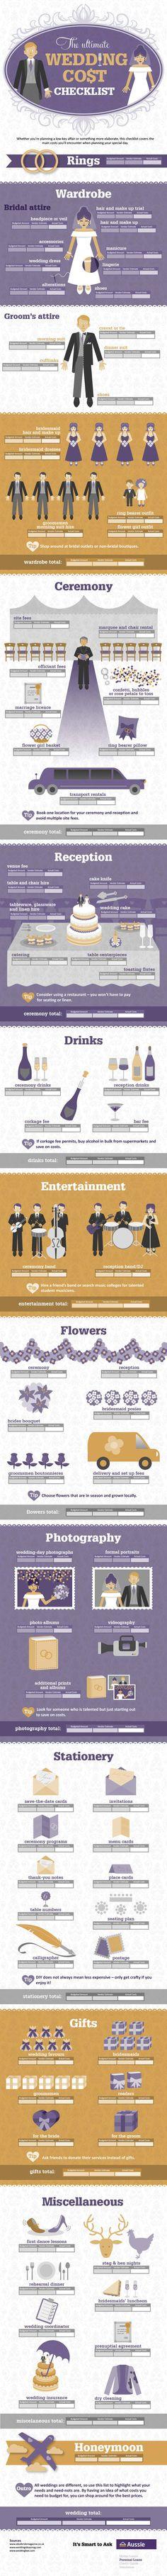 Georges Wedding Budget Spreadsheet Plus V